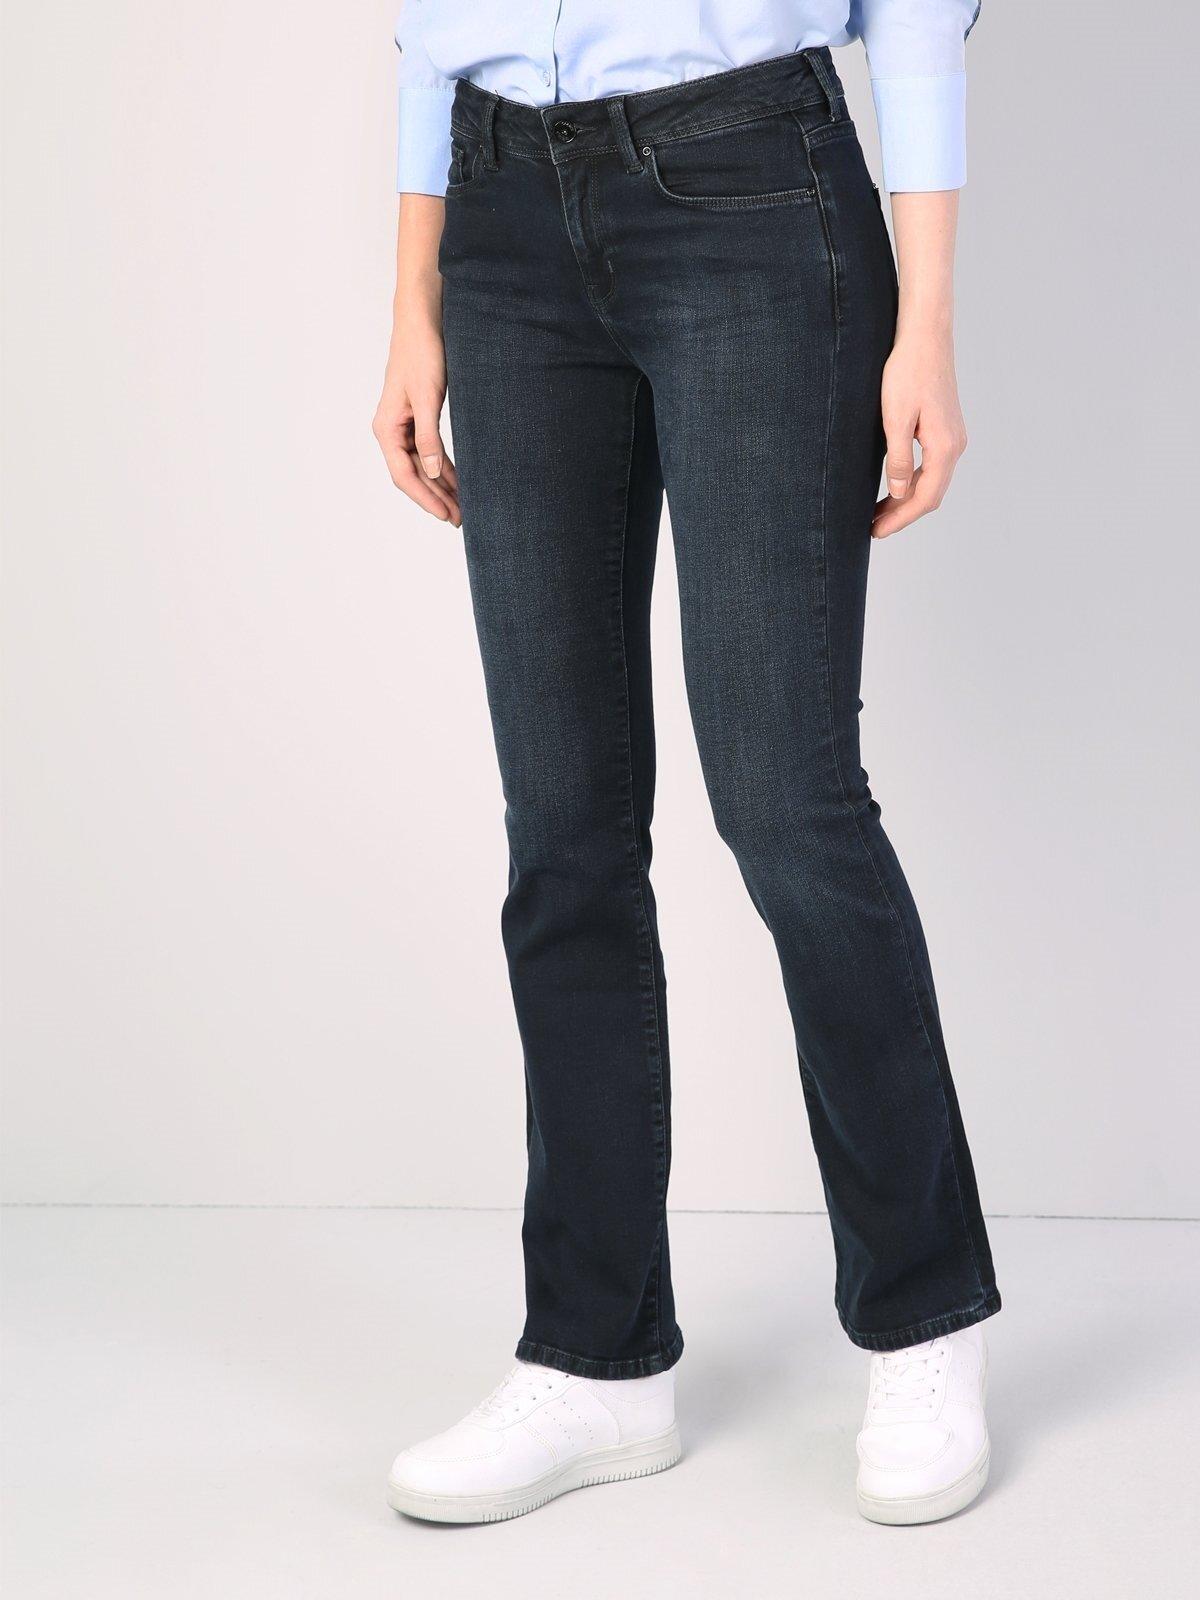 791 Monica Normal Kesim Orta Bel Geniş Paça Siyah Jean Pantolon